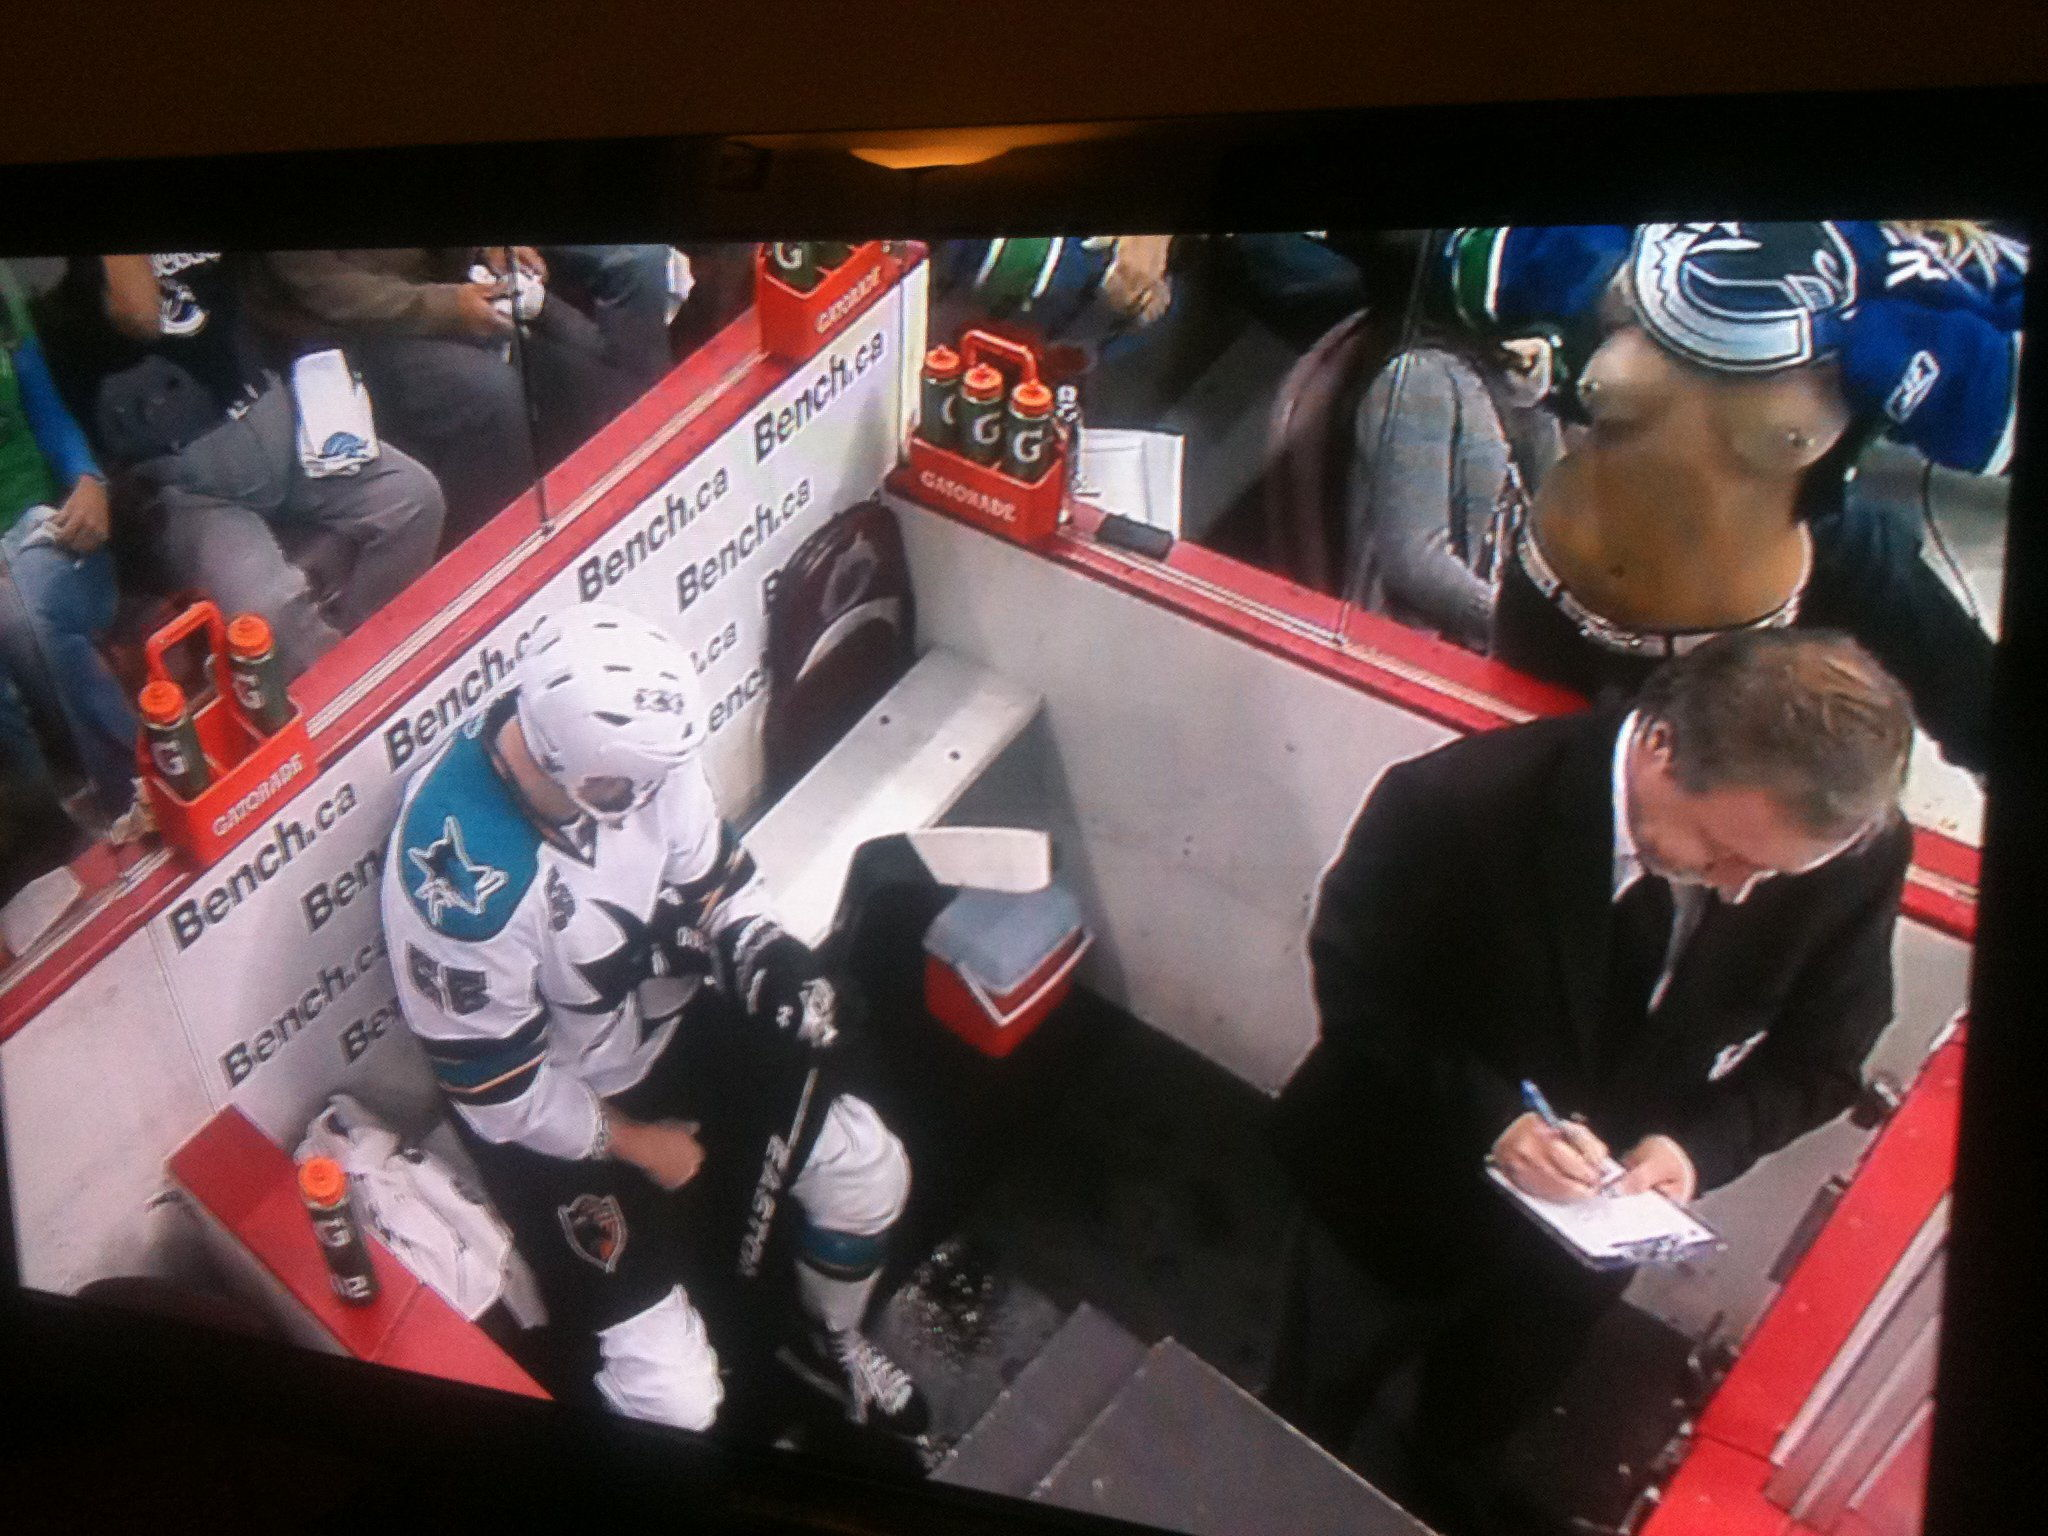 2011 NHL Playoffs Entertainment: Boobs and Green Men